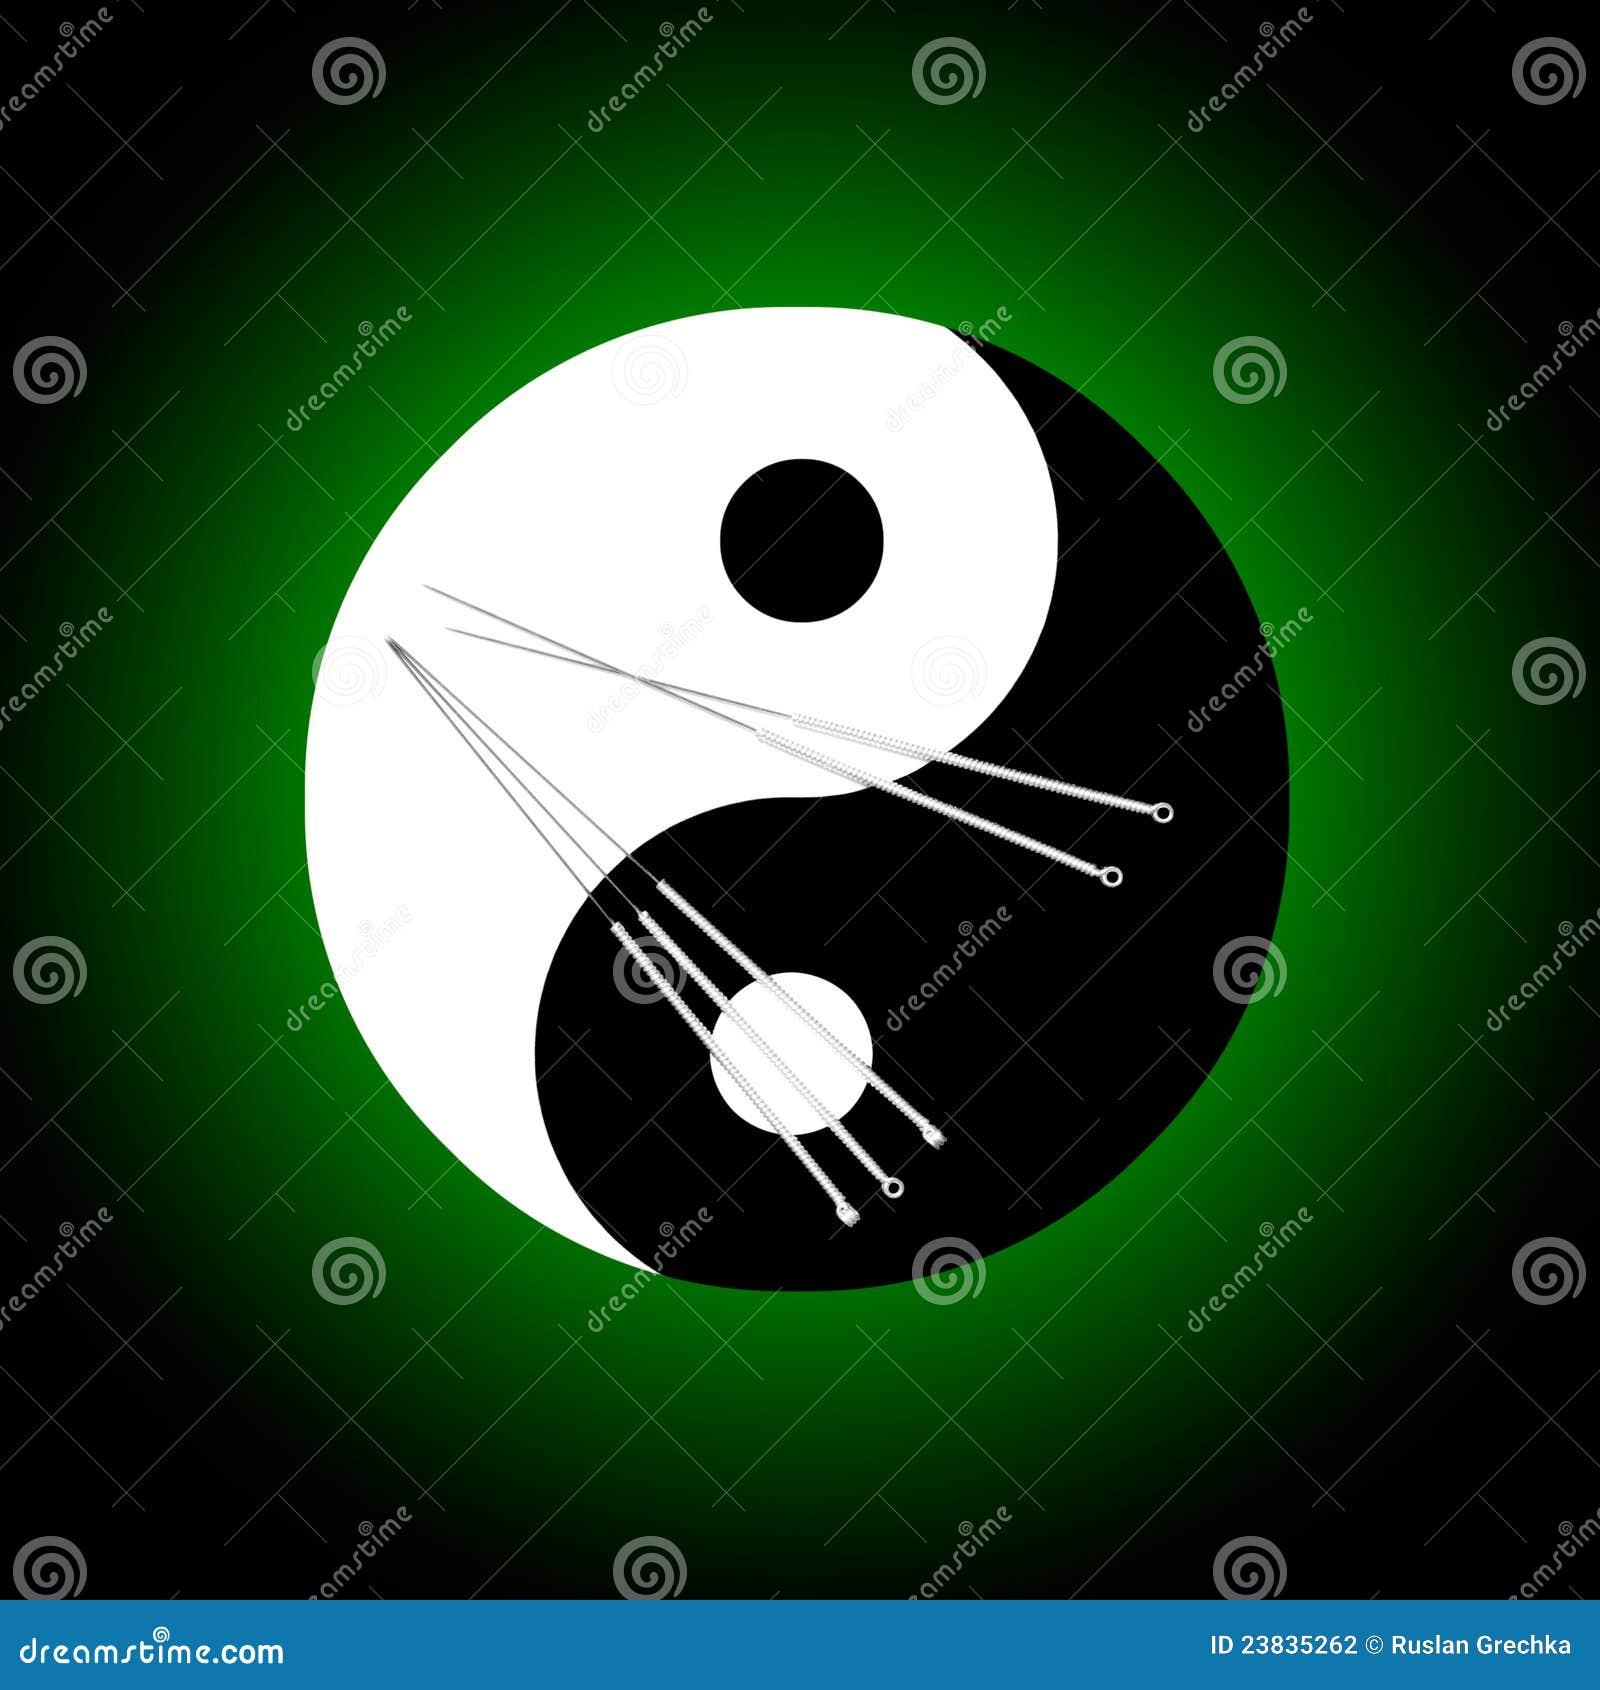 WWW_78YIN_COM_针灸背景针符号杨yin.